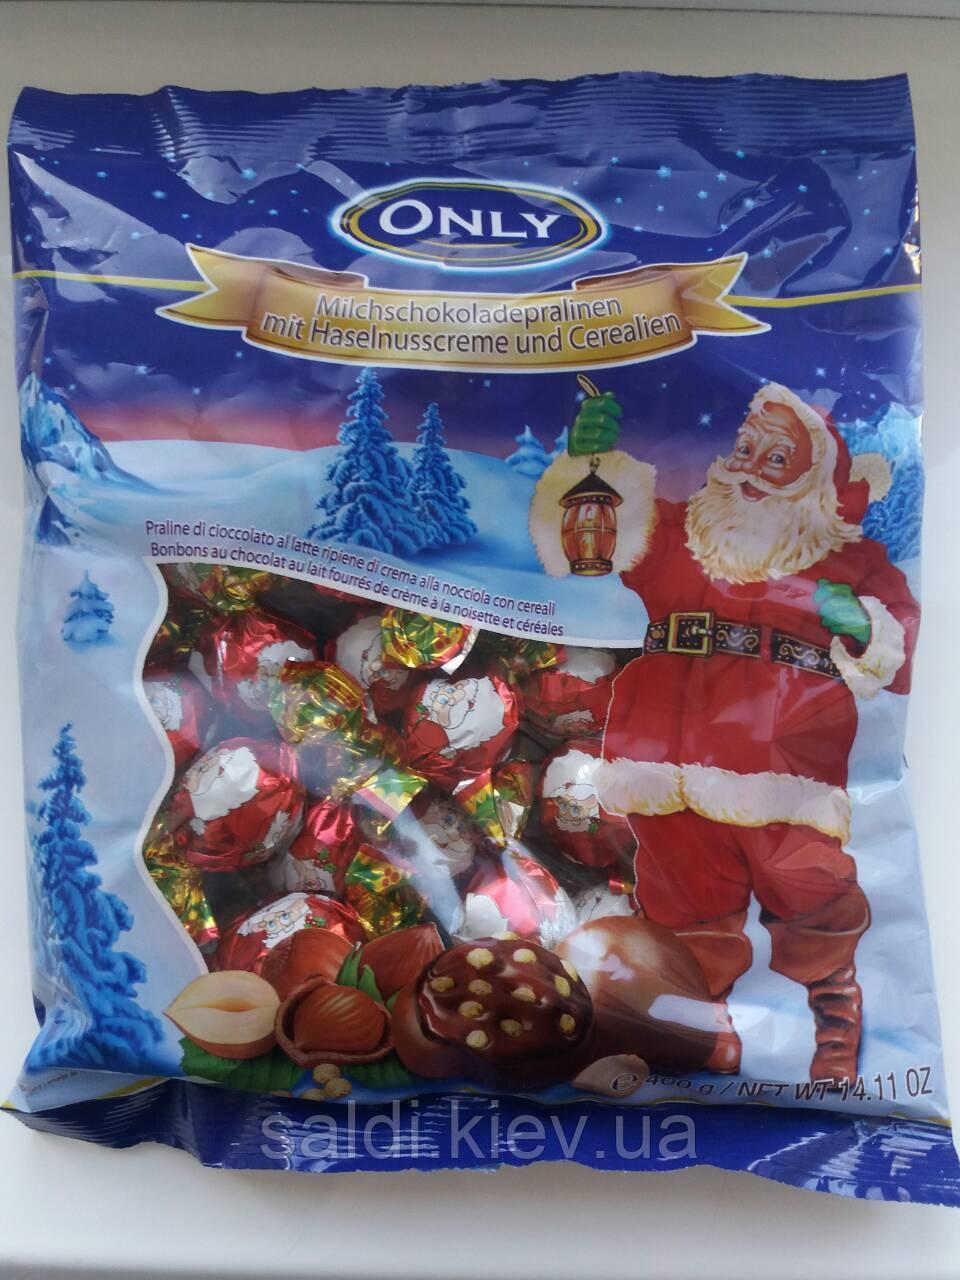 Новогодний набор конфет Only, 400 гр